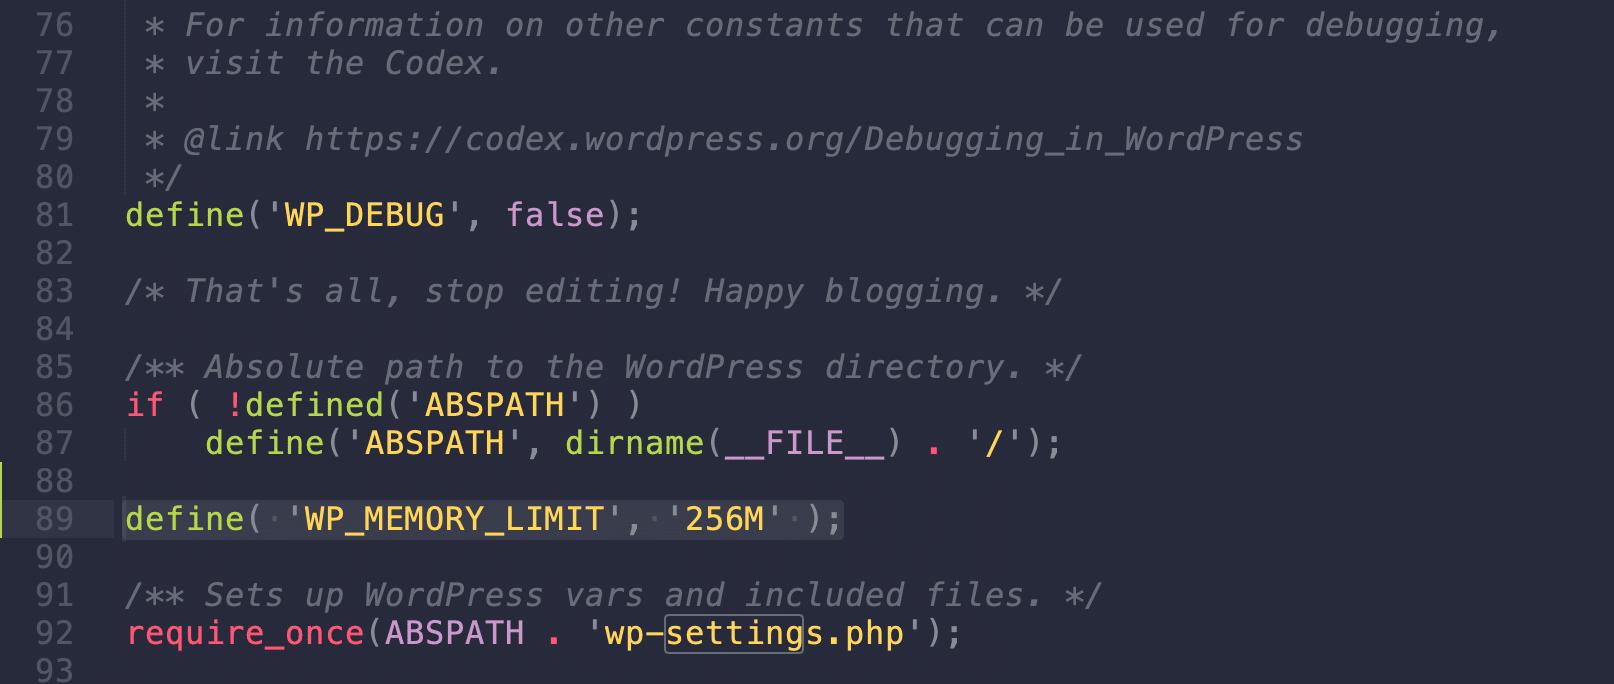 wp-config.php内のWP_MEMORY_LIMIT